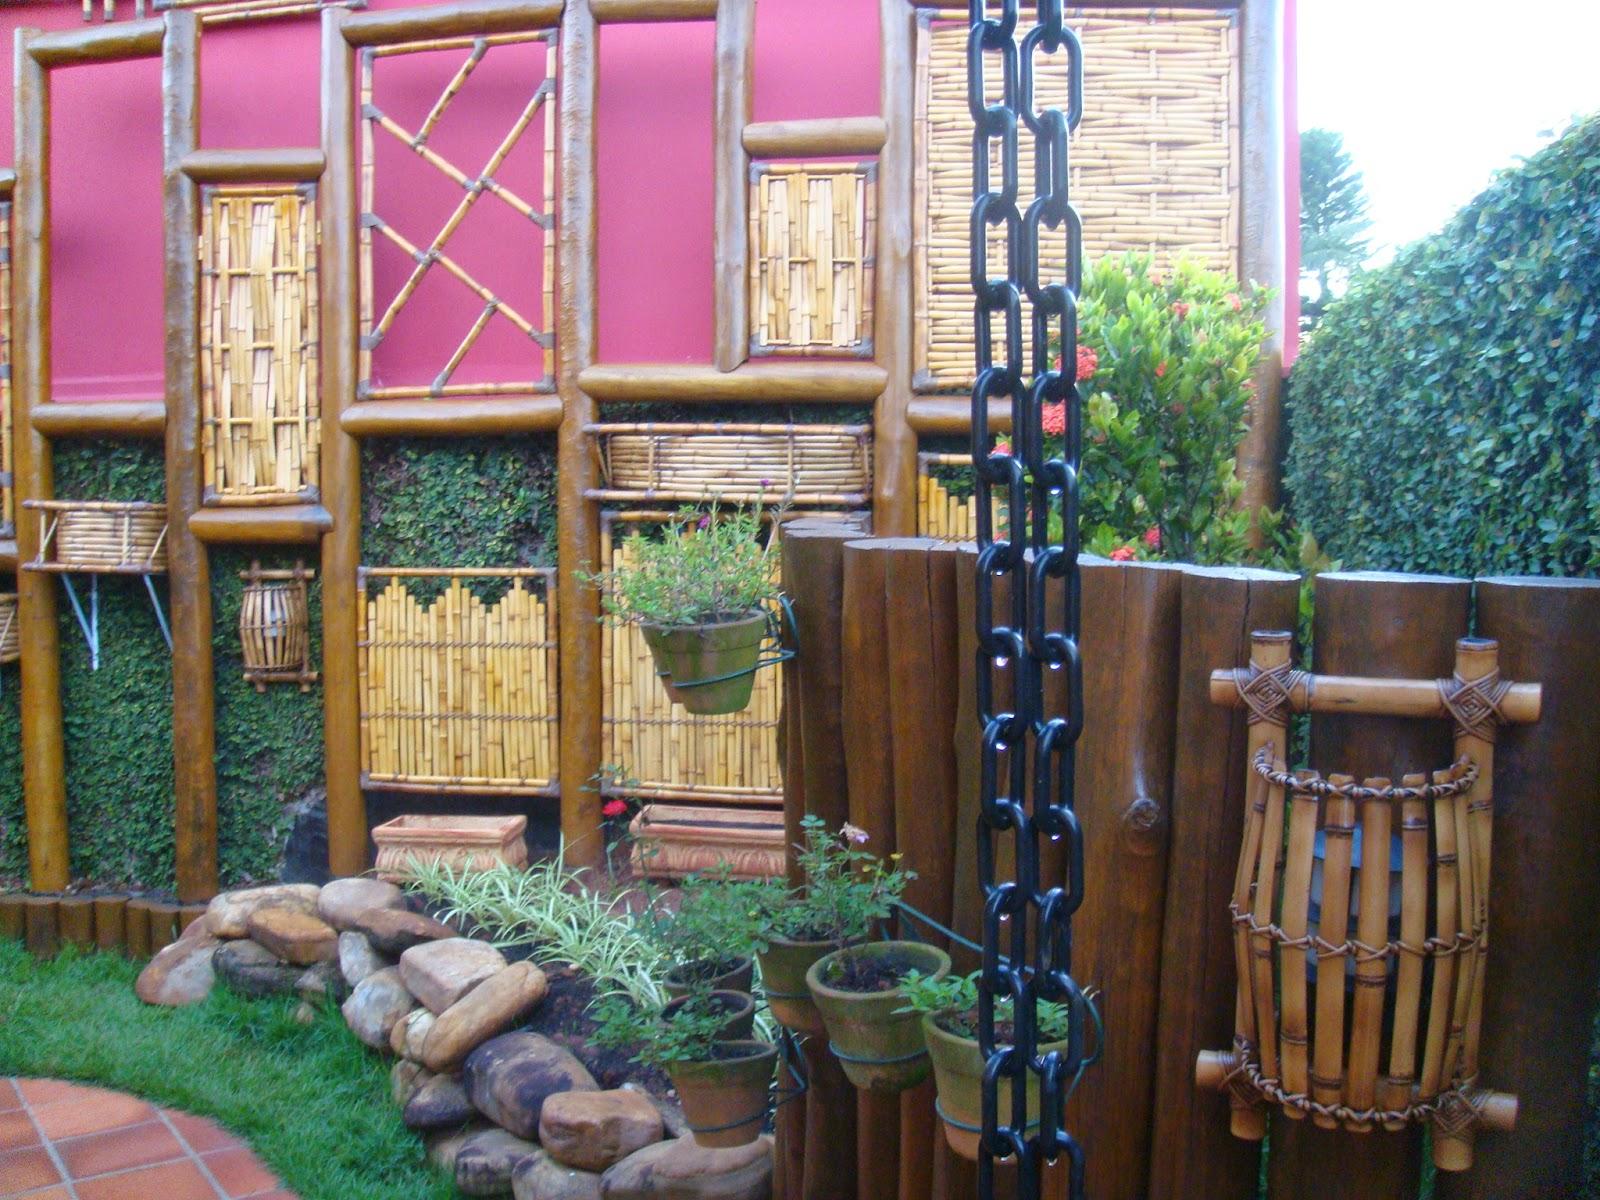 jardim vertical bambu:Arte em Bambu: Jardim Vertical em Bambu